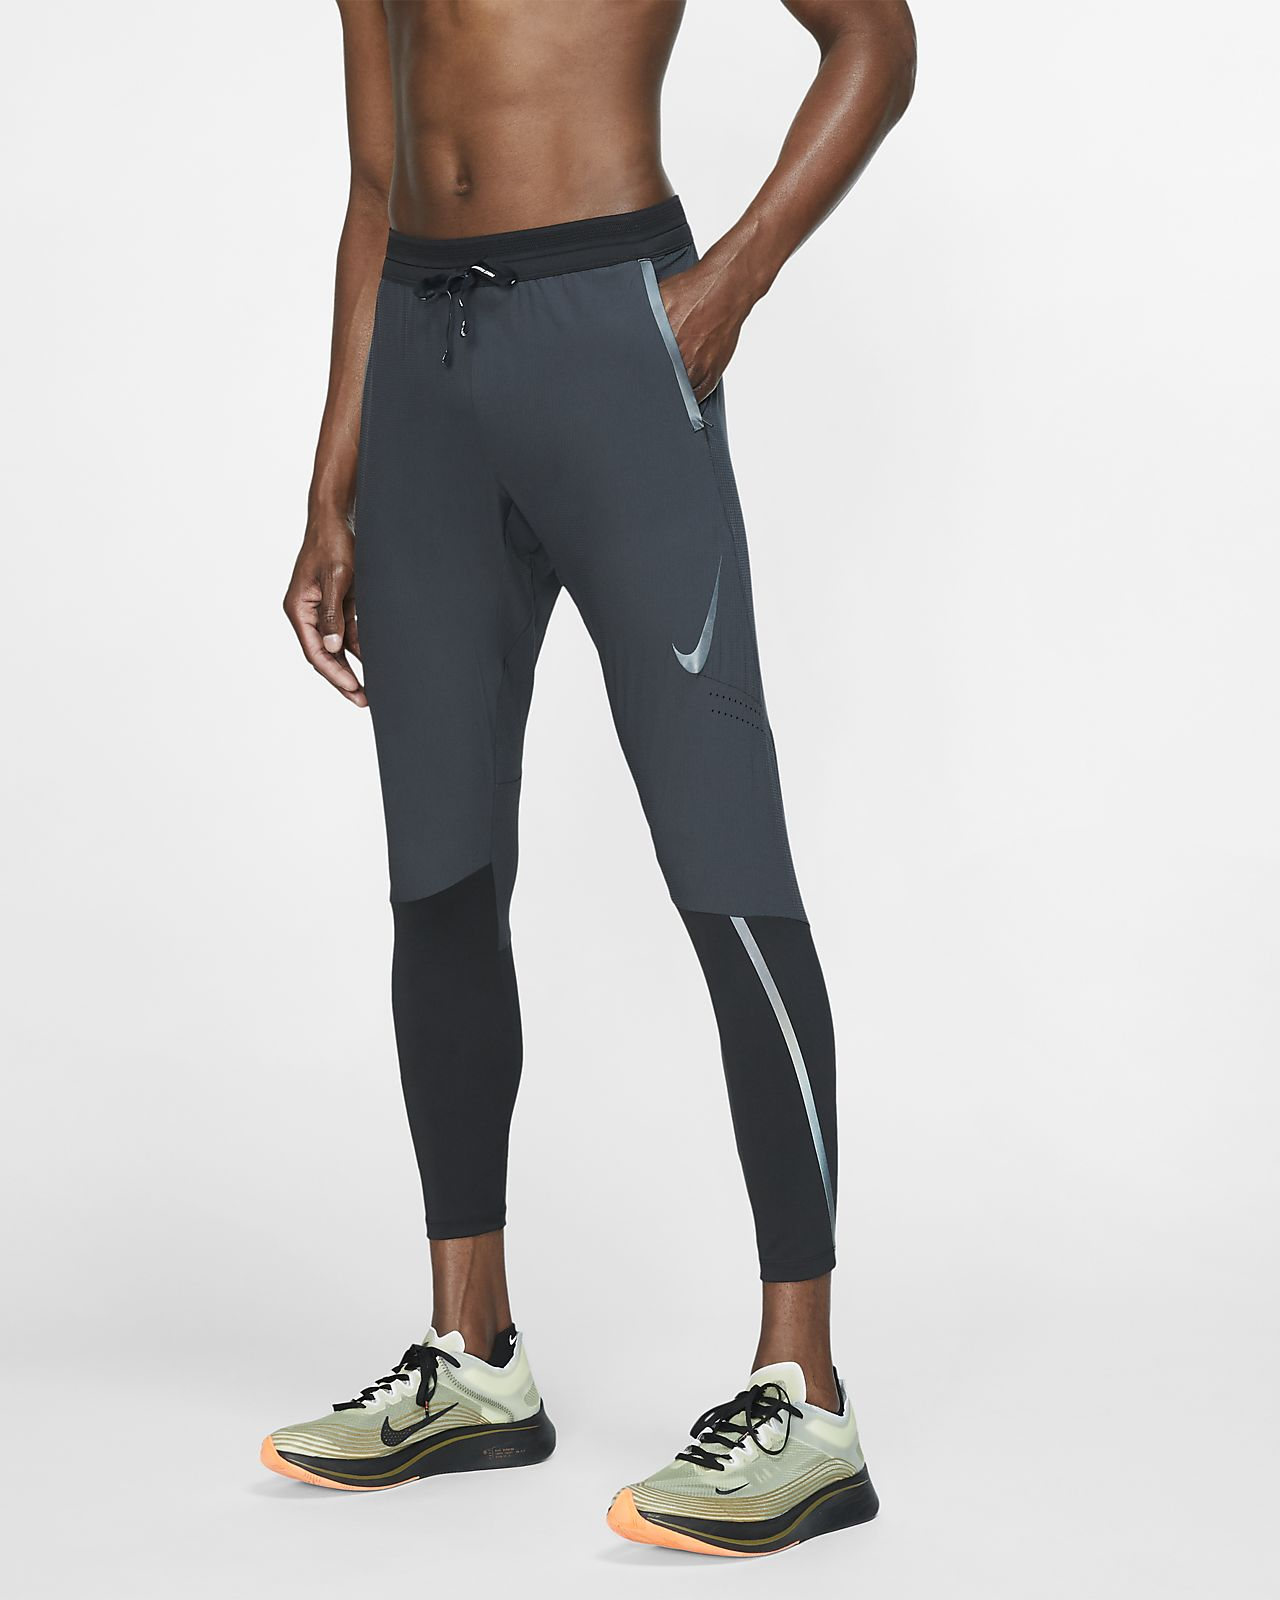 nordic     spodnie do biegania męskie NIKE POWER RUN TIGHT